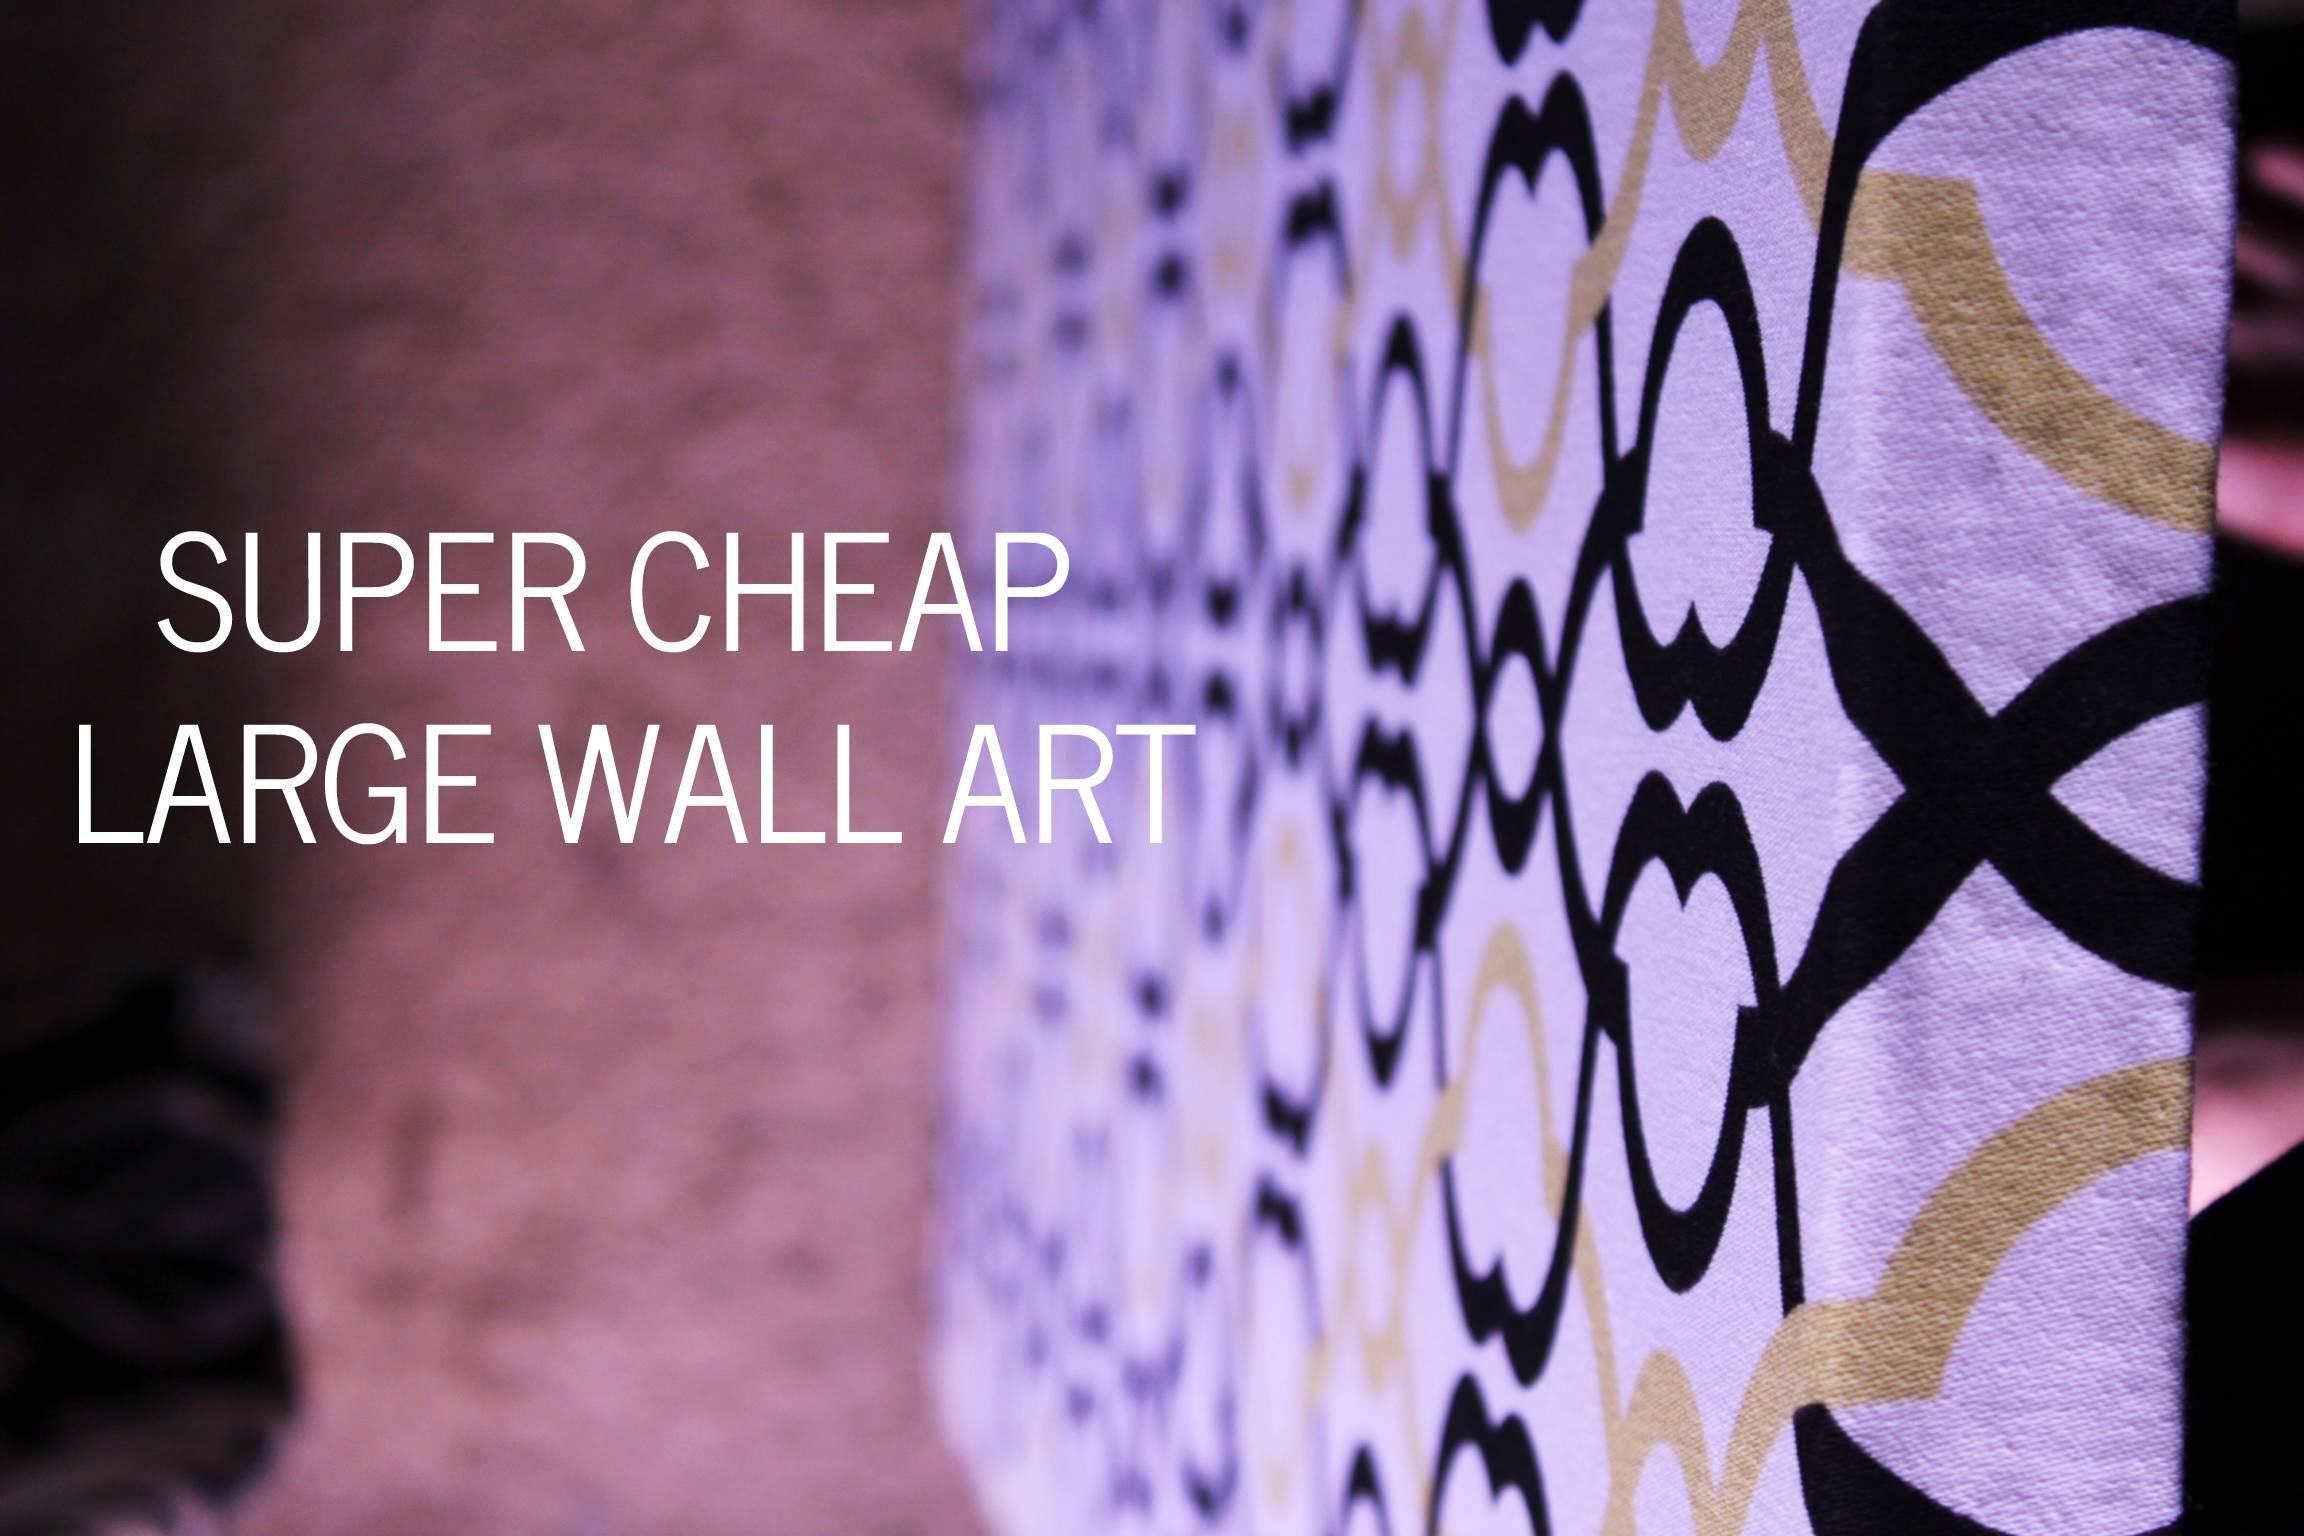 Wall Art Design Ideas: Purple Abstract Cheap Large Wall Art Super Regarding Most Recently Released Big Cheap Wall Art (View 2 of 20)